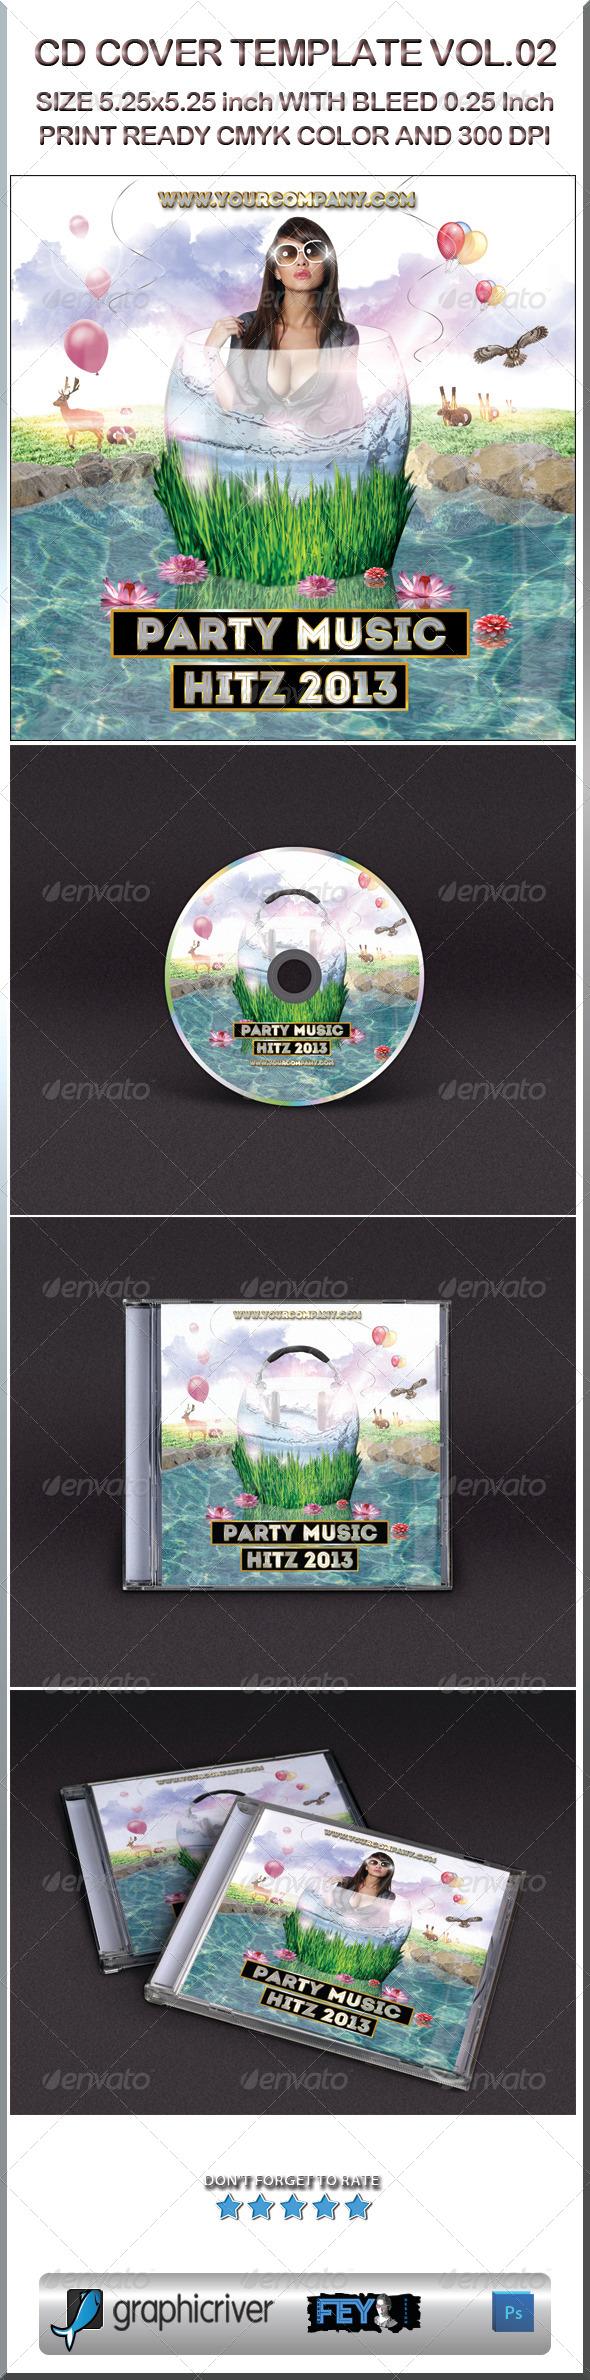 GraphicRiver CD Cover Template Vol.02 6041070